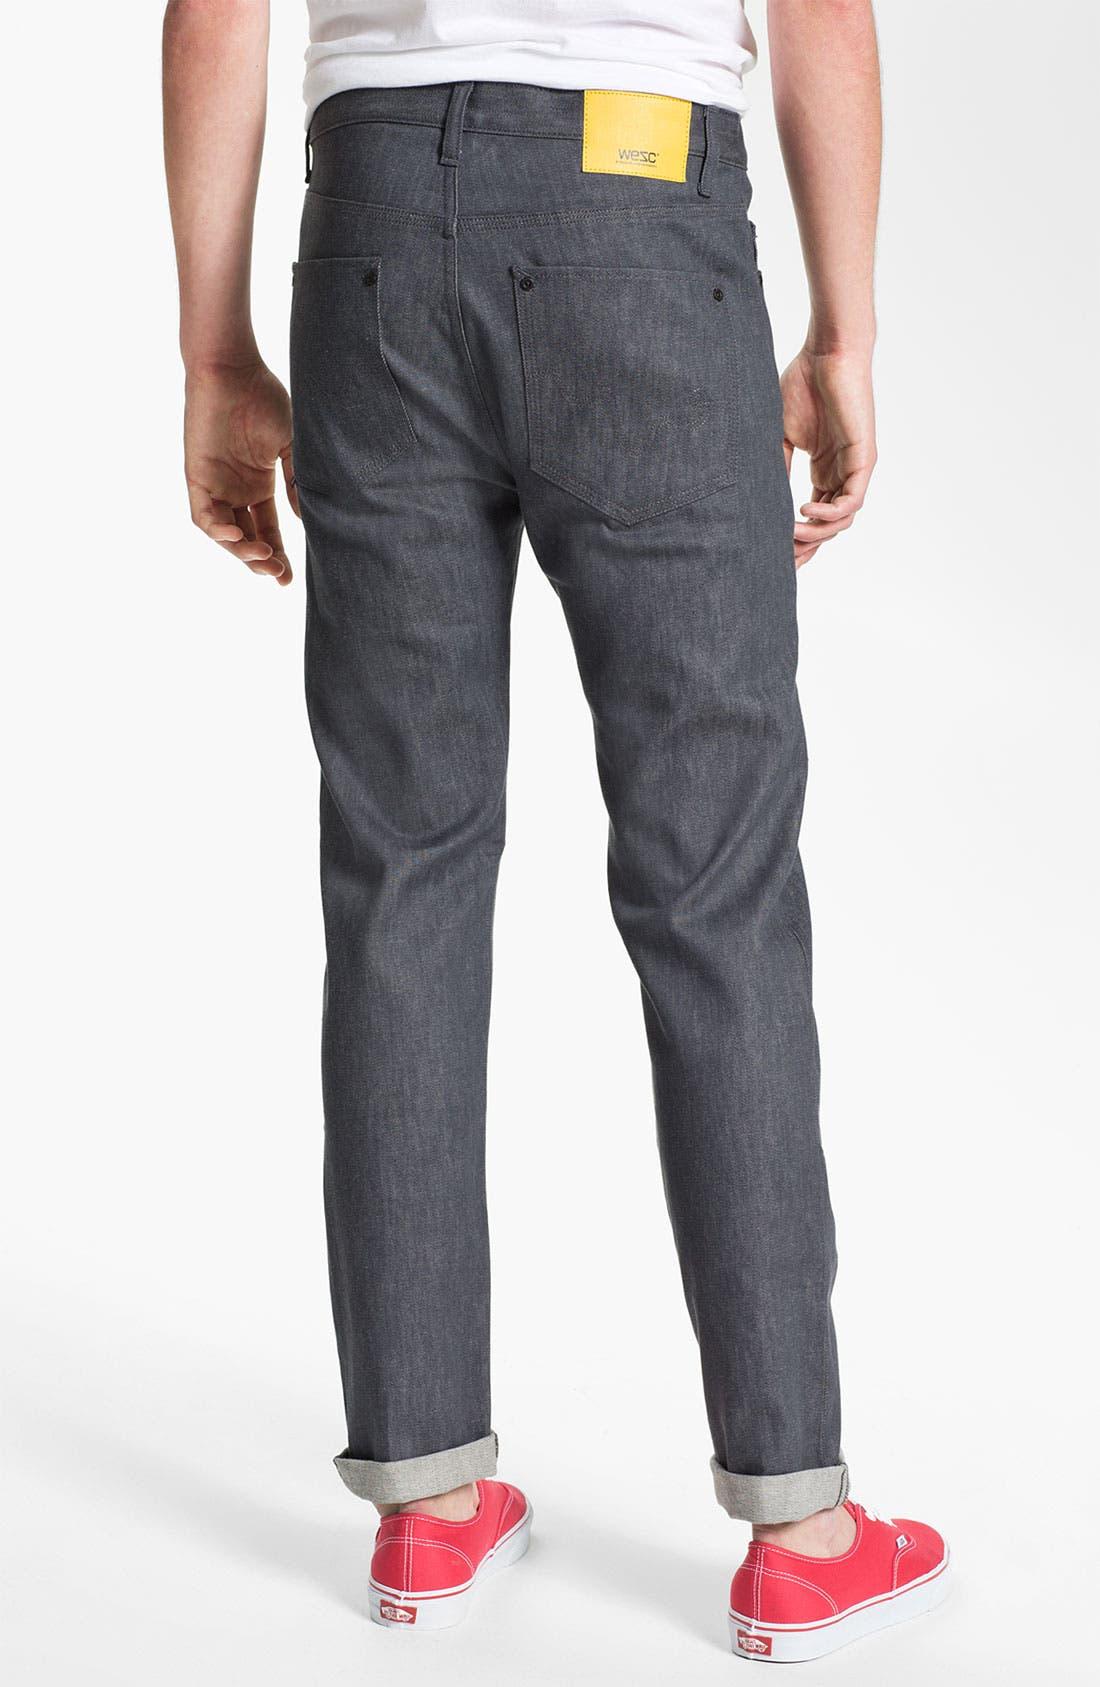 Alternate Image 1 Selected - WeSC 'Eddy' Slim Fit Jeans (Raw Grey)